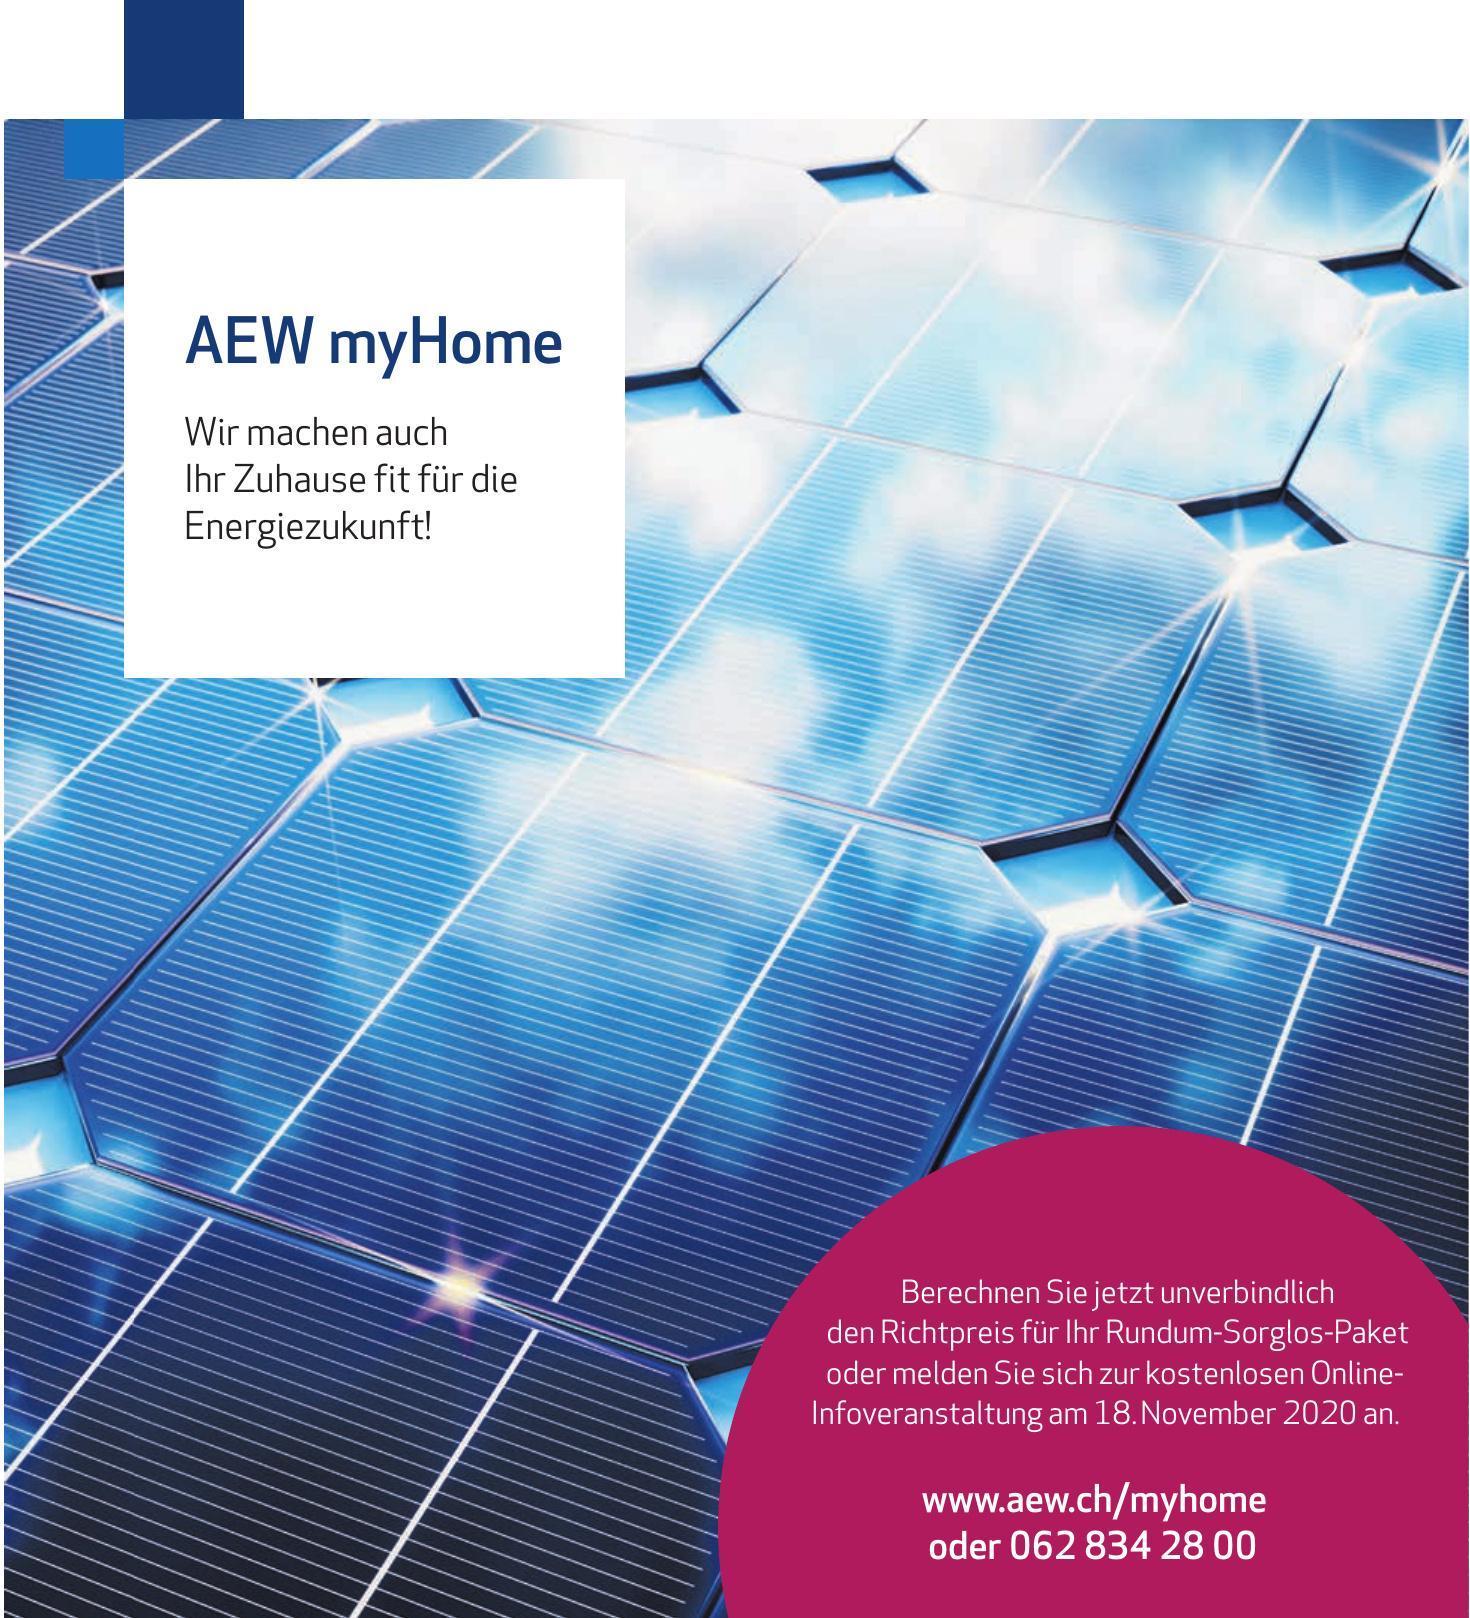 AEW Energie AG